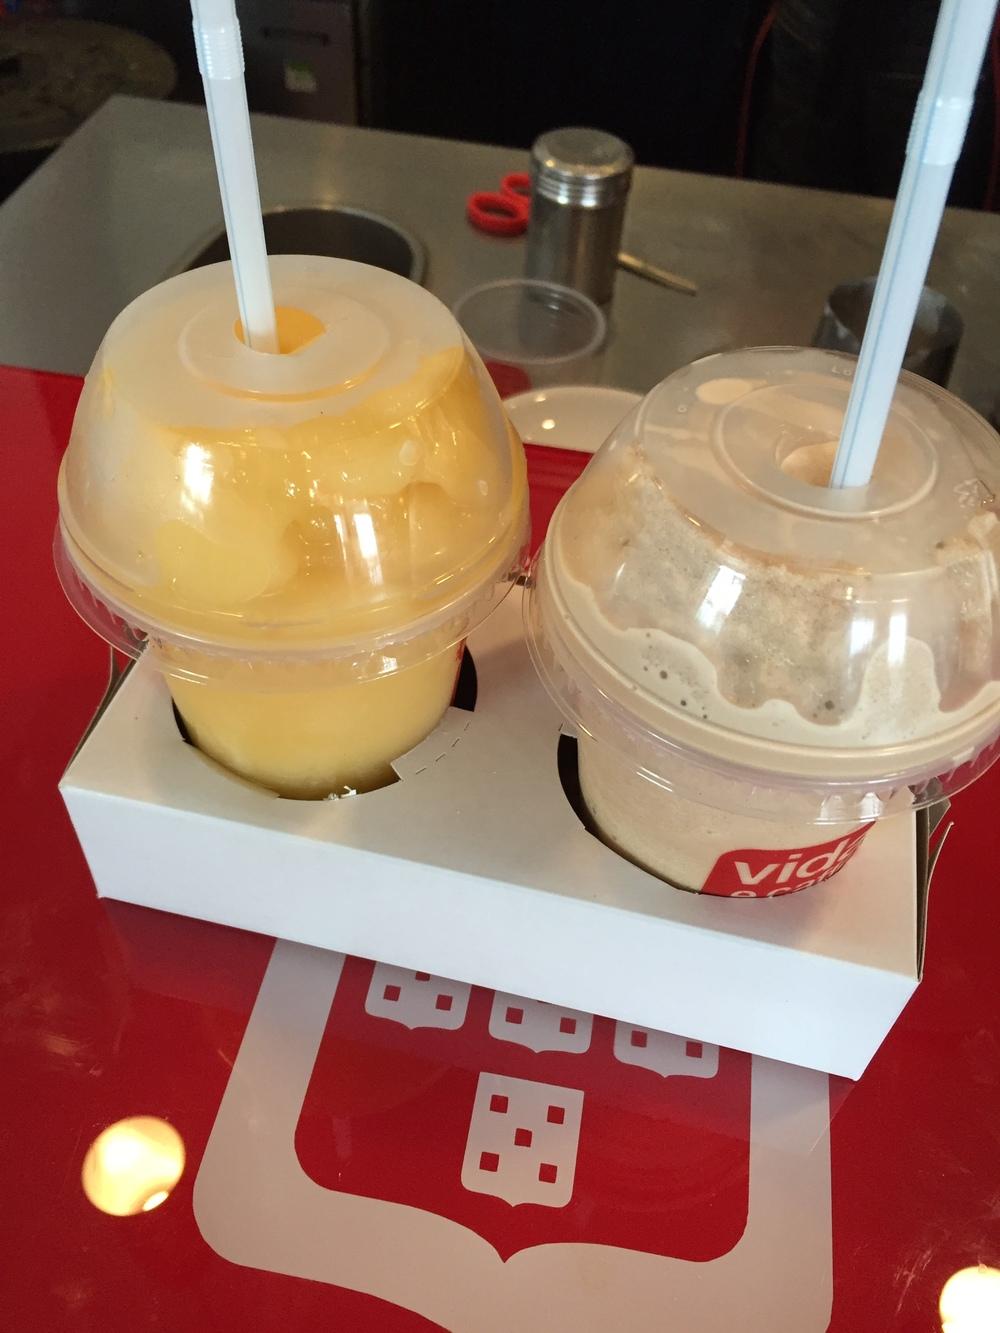 Left to right: Mango frio and Chai frio